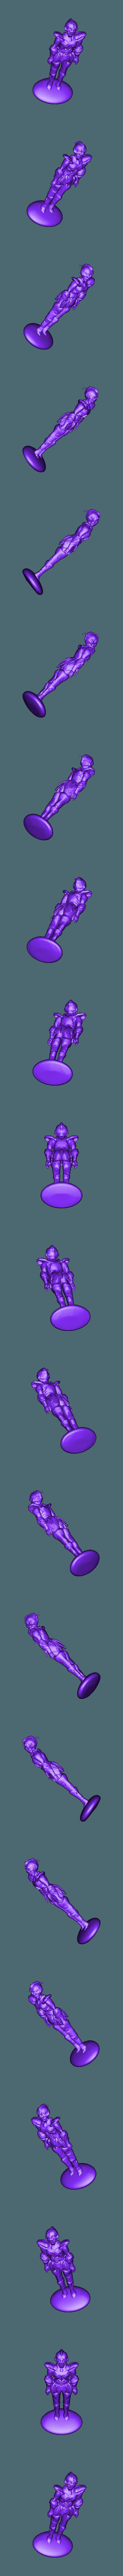 chevalier poisson.obj Download OBJ file 10 Intergalactic Humanoids • 3D print object, Majin59